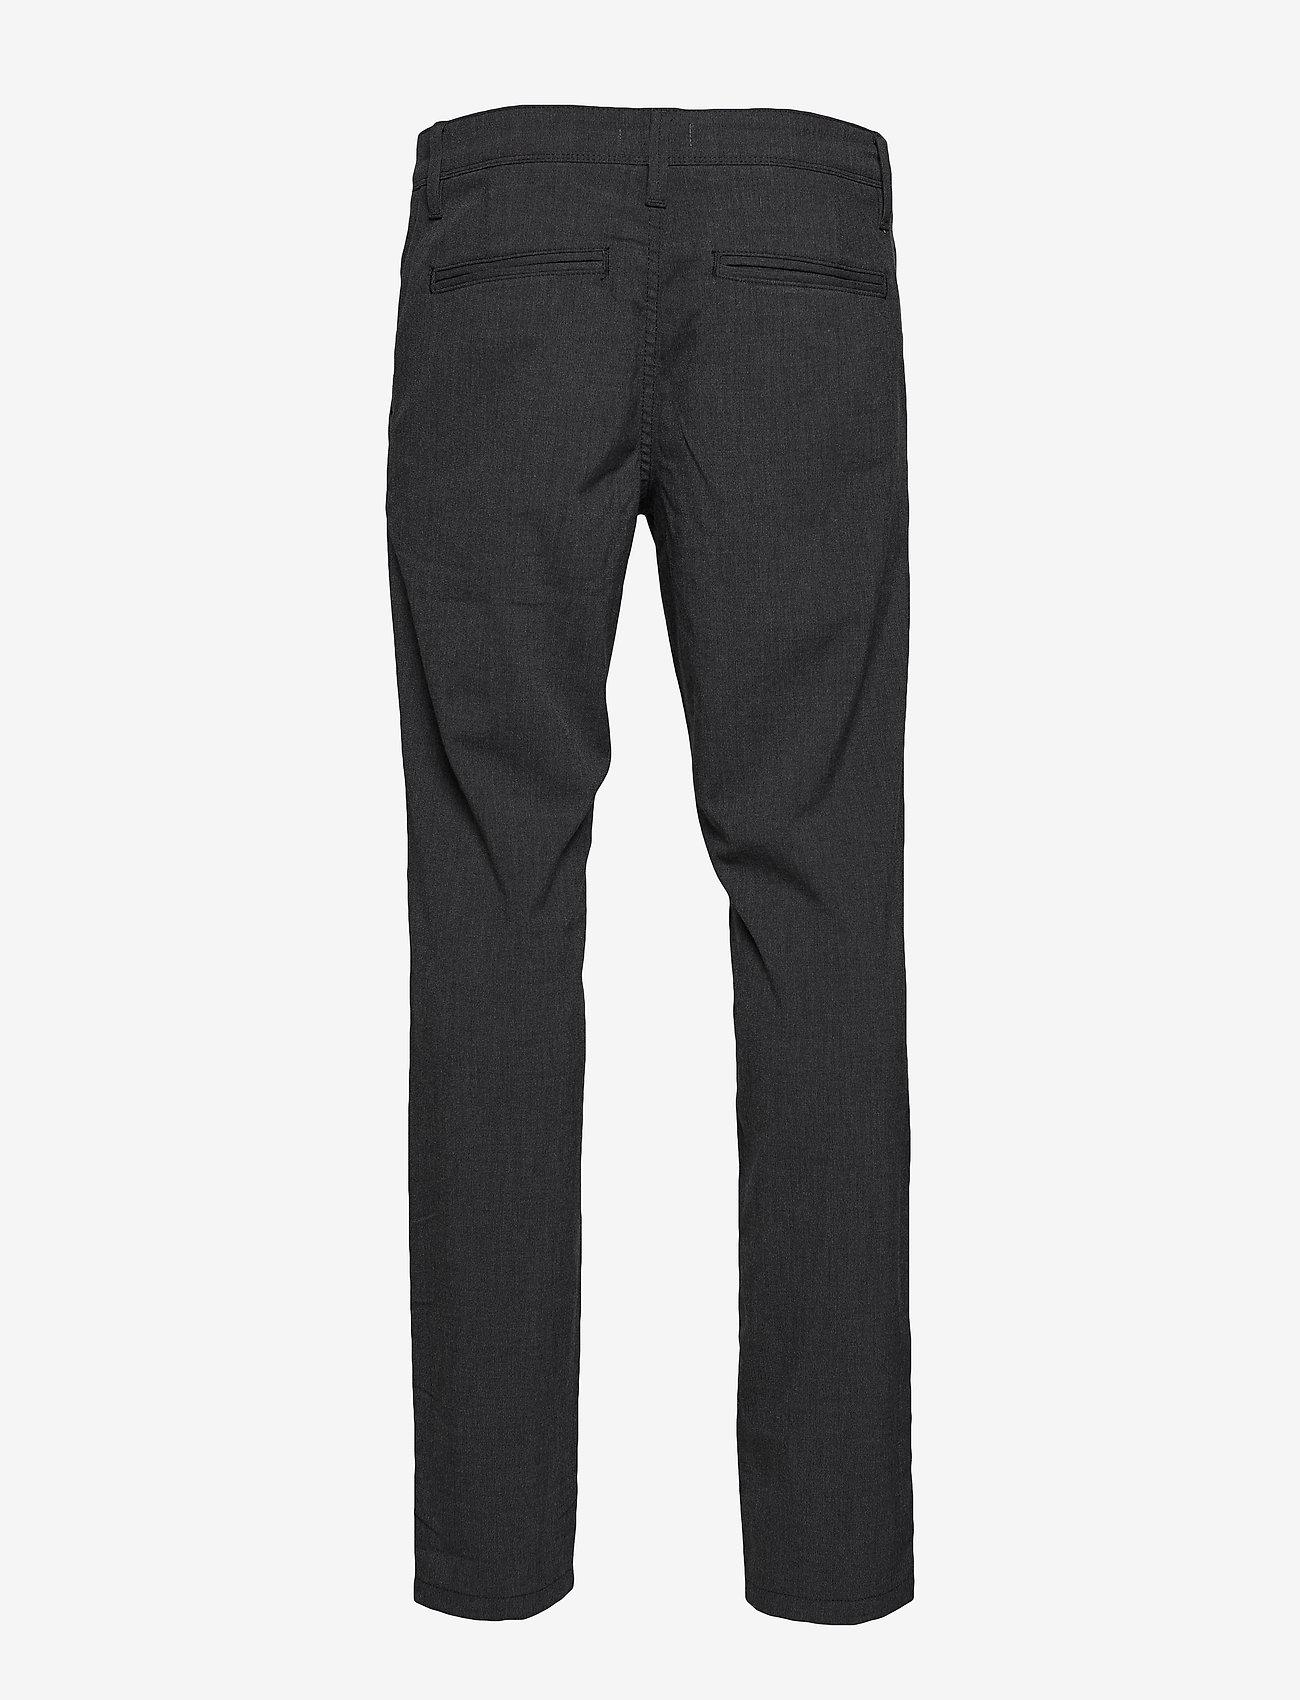 Selected Homme - SLHSLIM-STORM FLEX SMART PANTS W NOOS - suitbukser - grey melange - 1